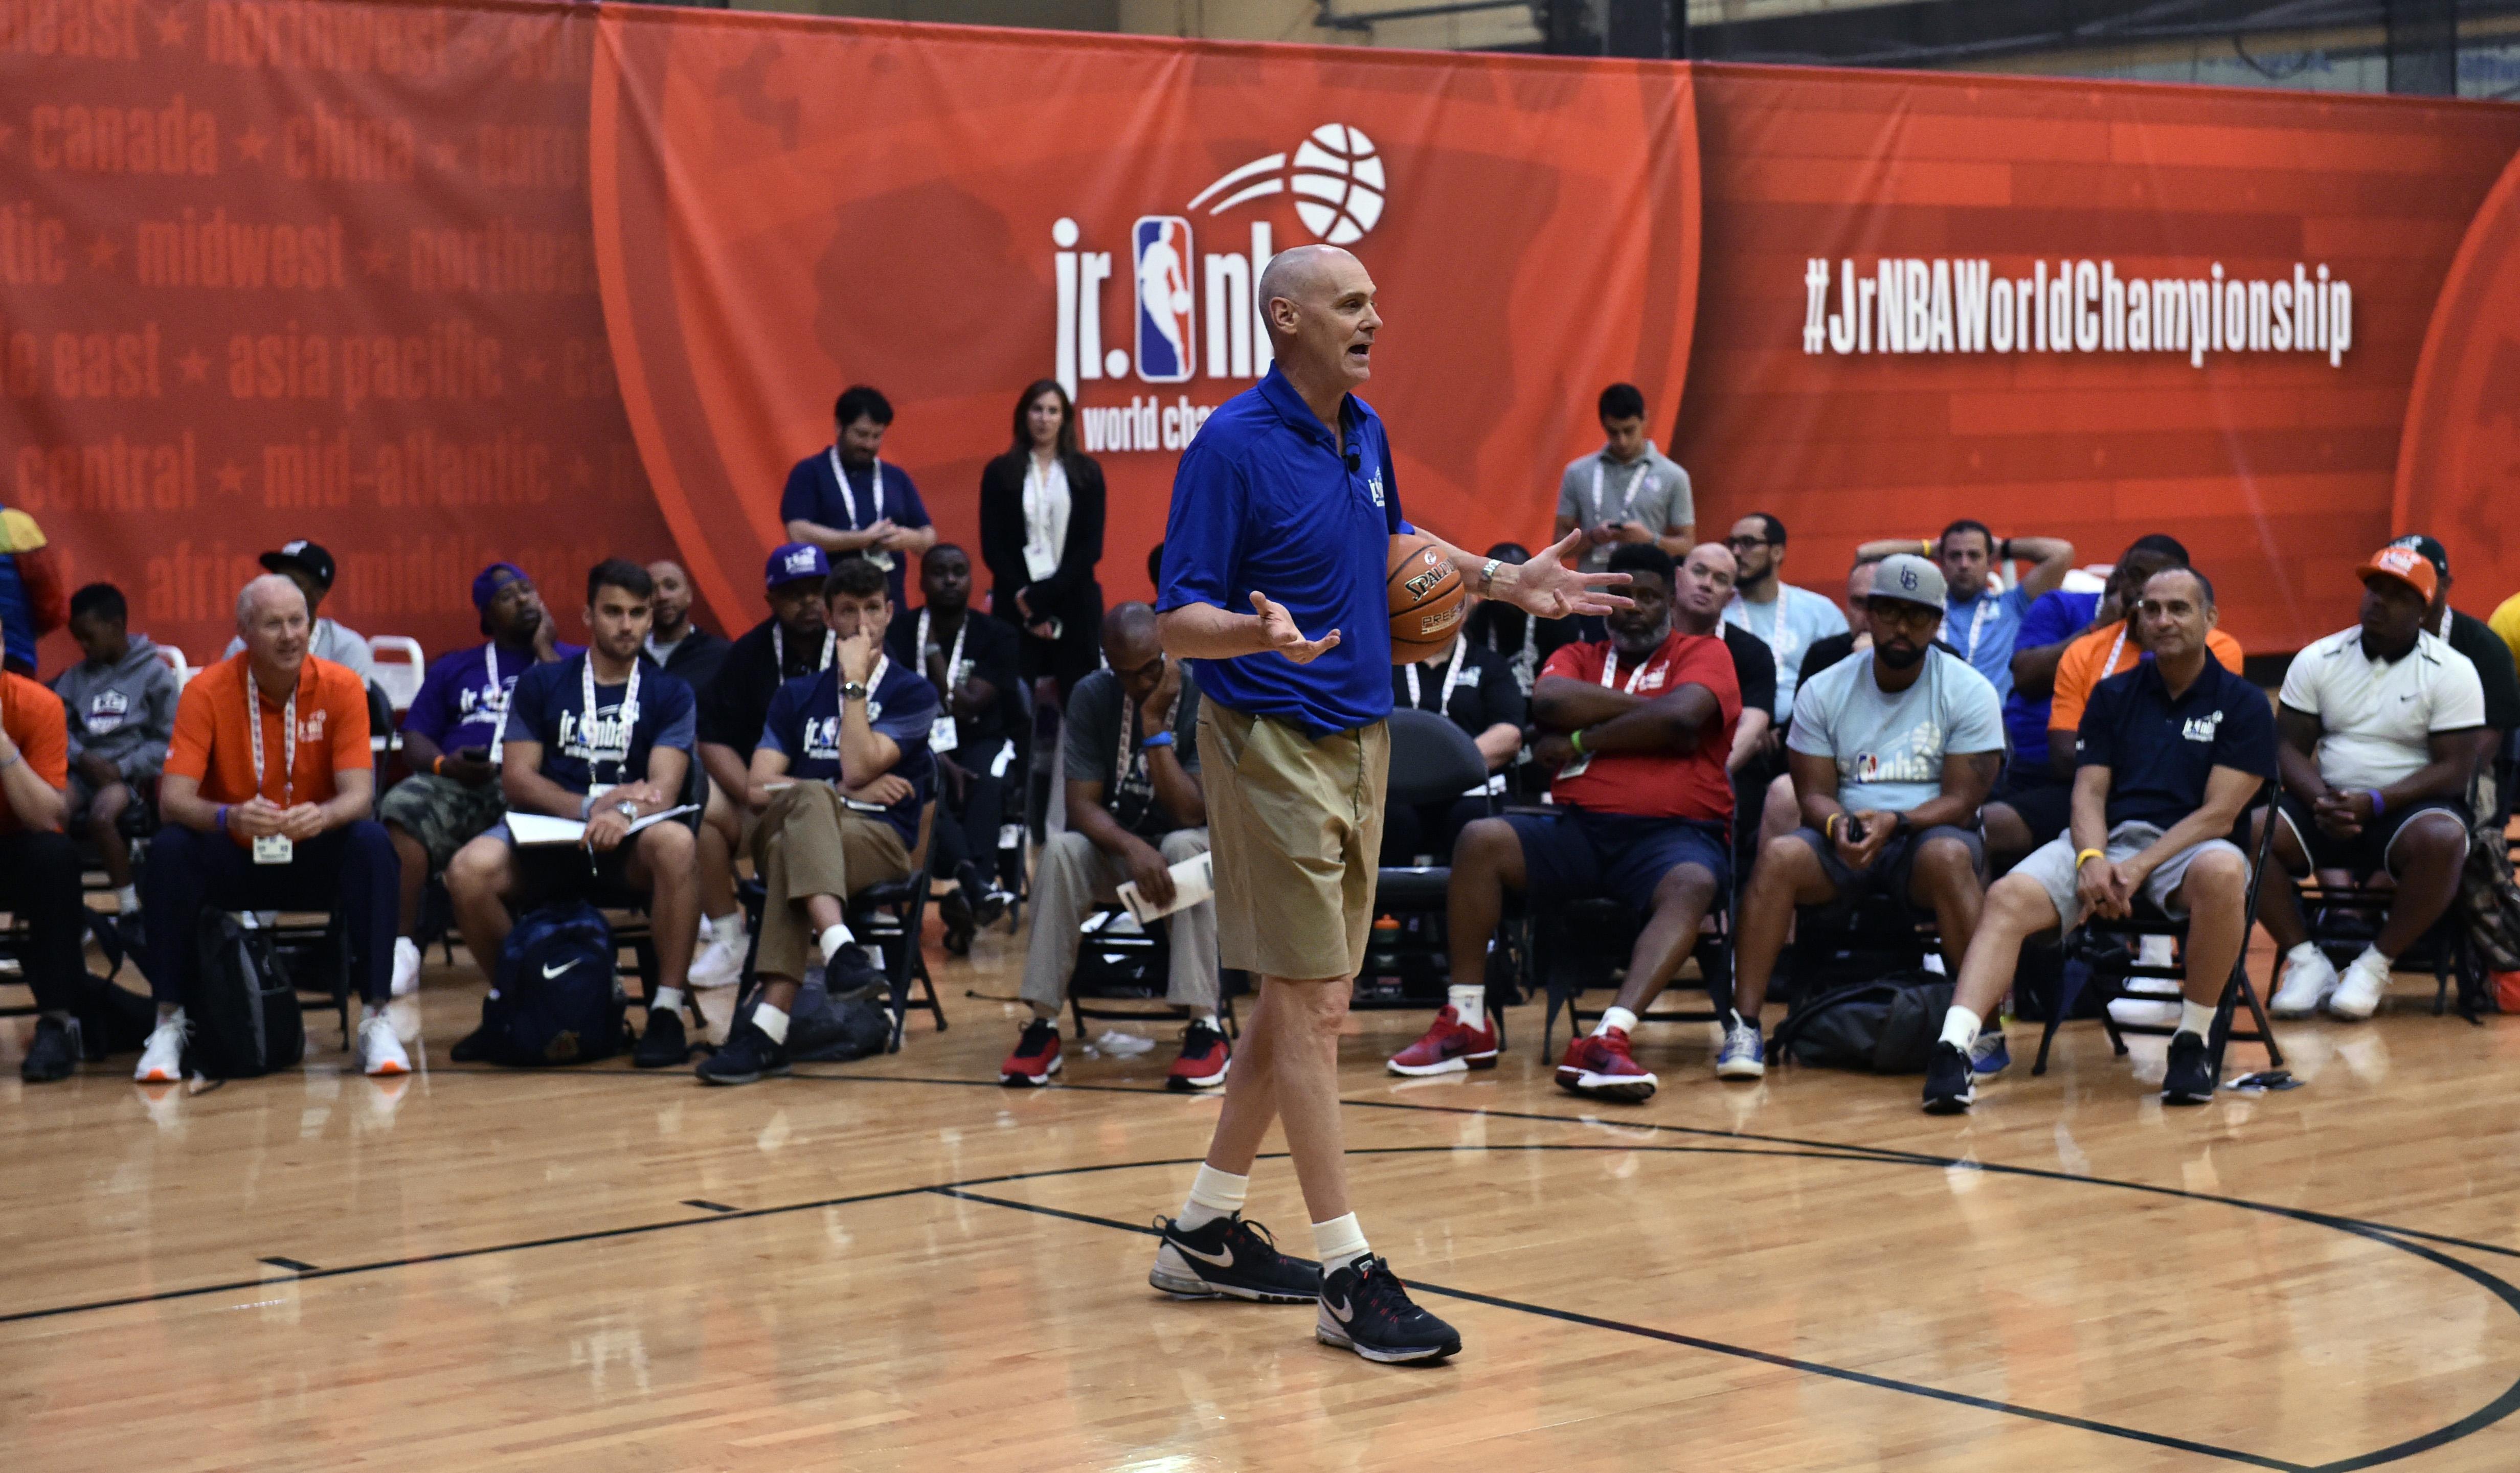 Jr. NBA World Championship Tournament - Coaching Clinic